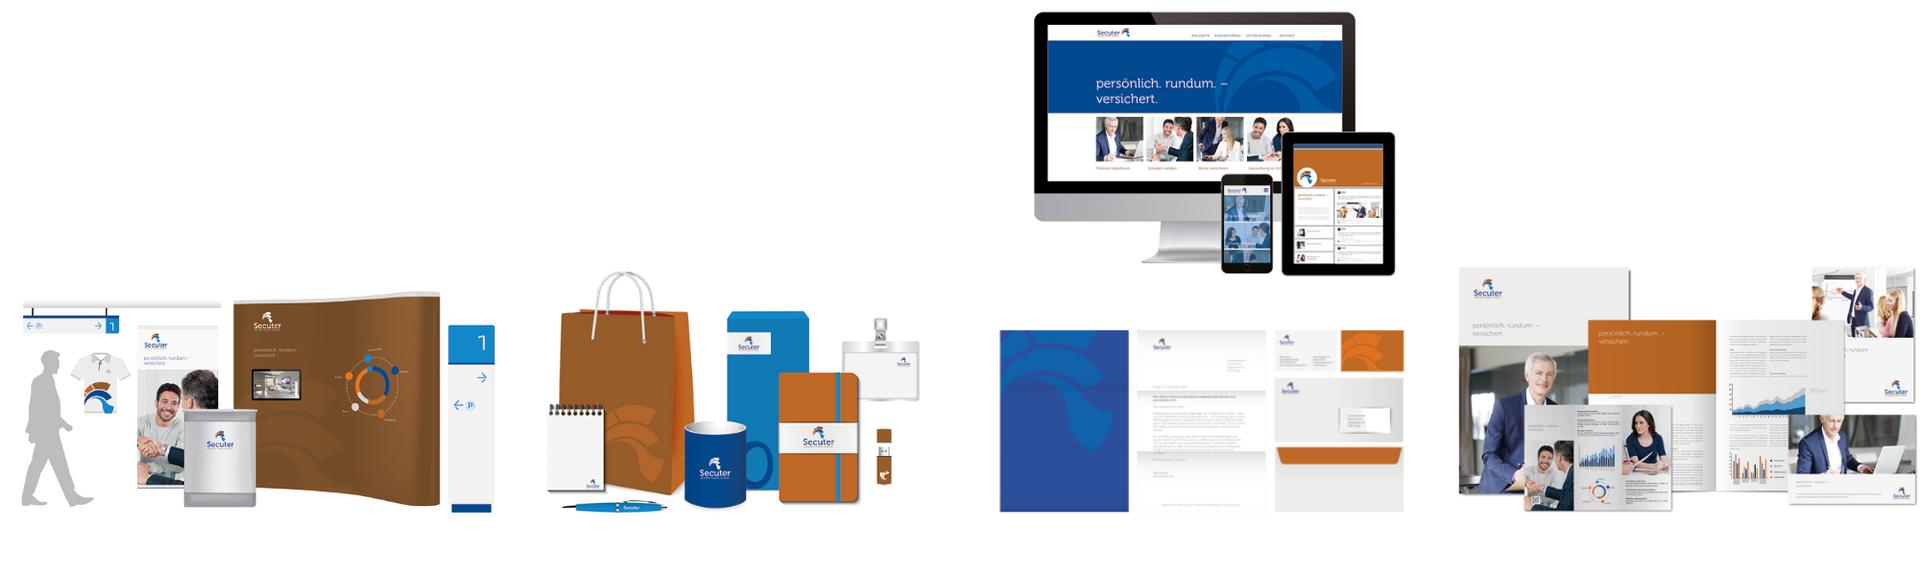 Corporate Design Lösung für Beratung